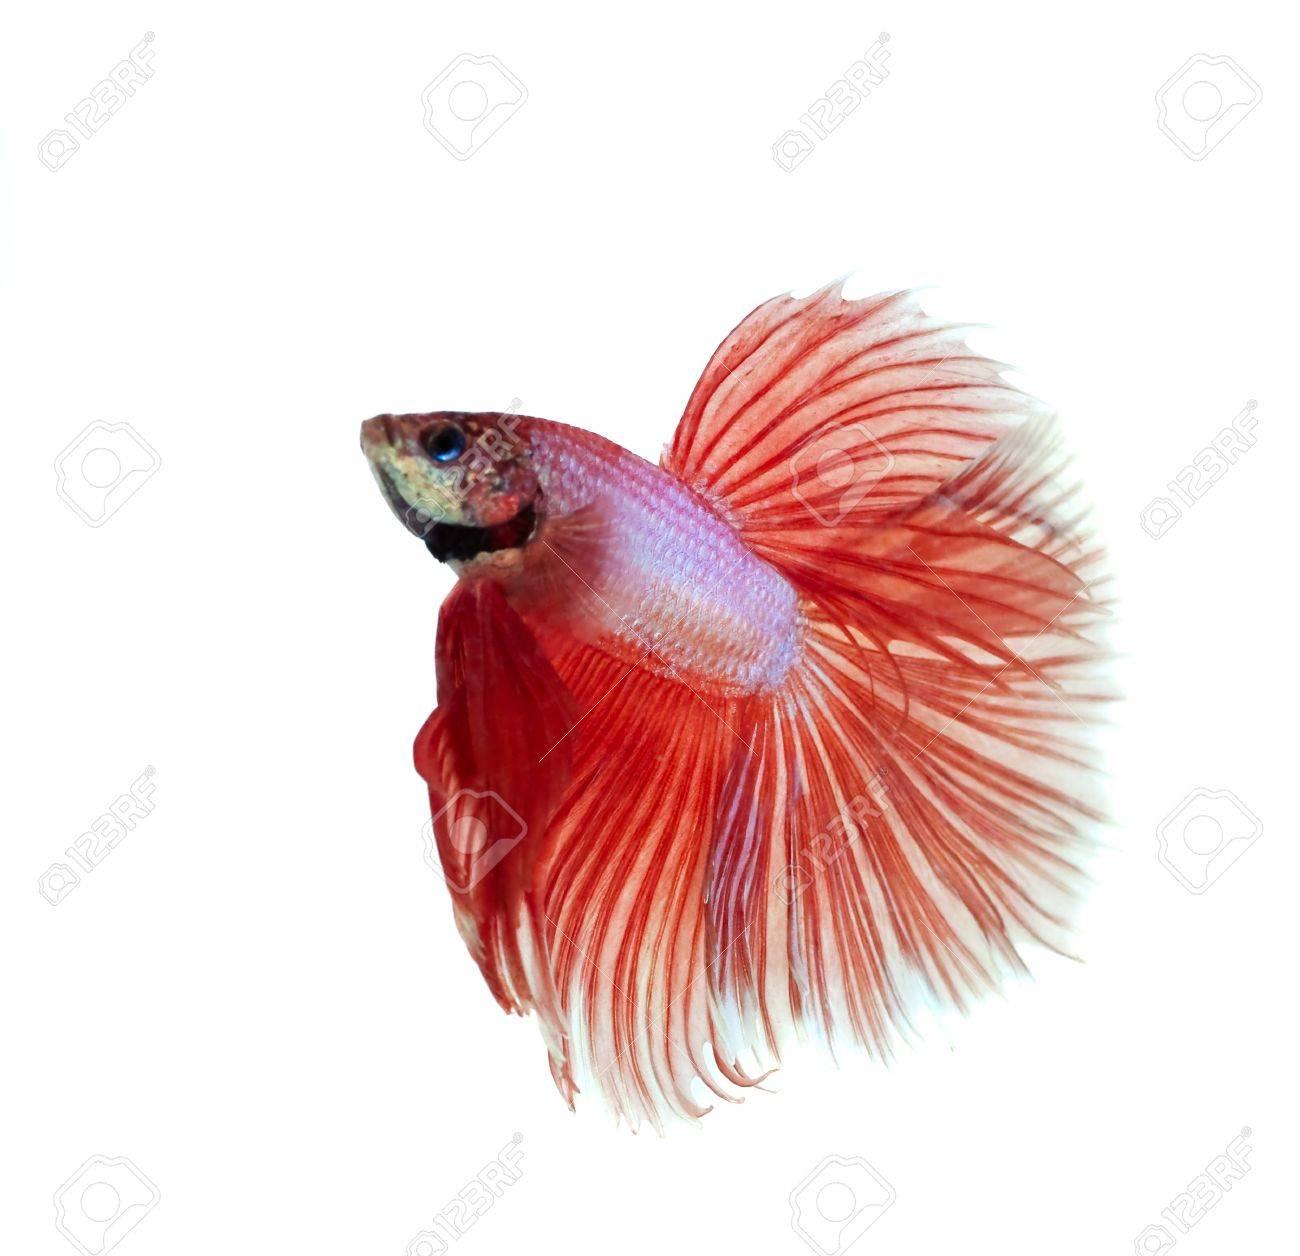 orange siamese fighting fish Stock Photo - 20378926